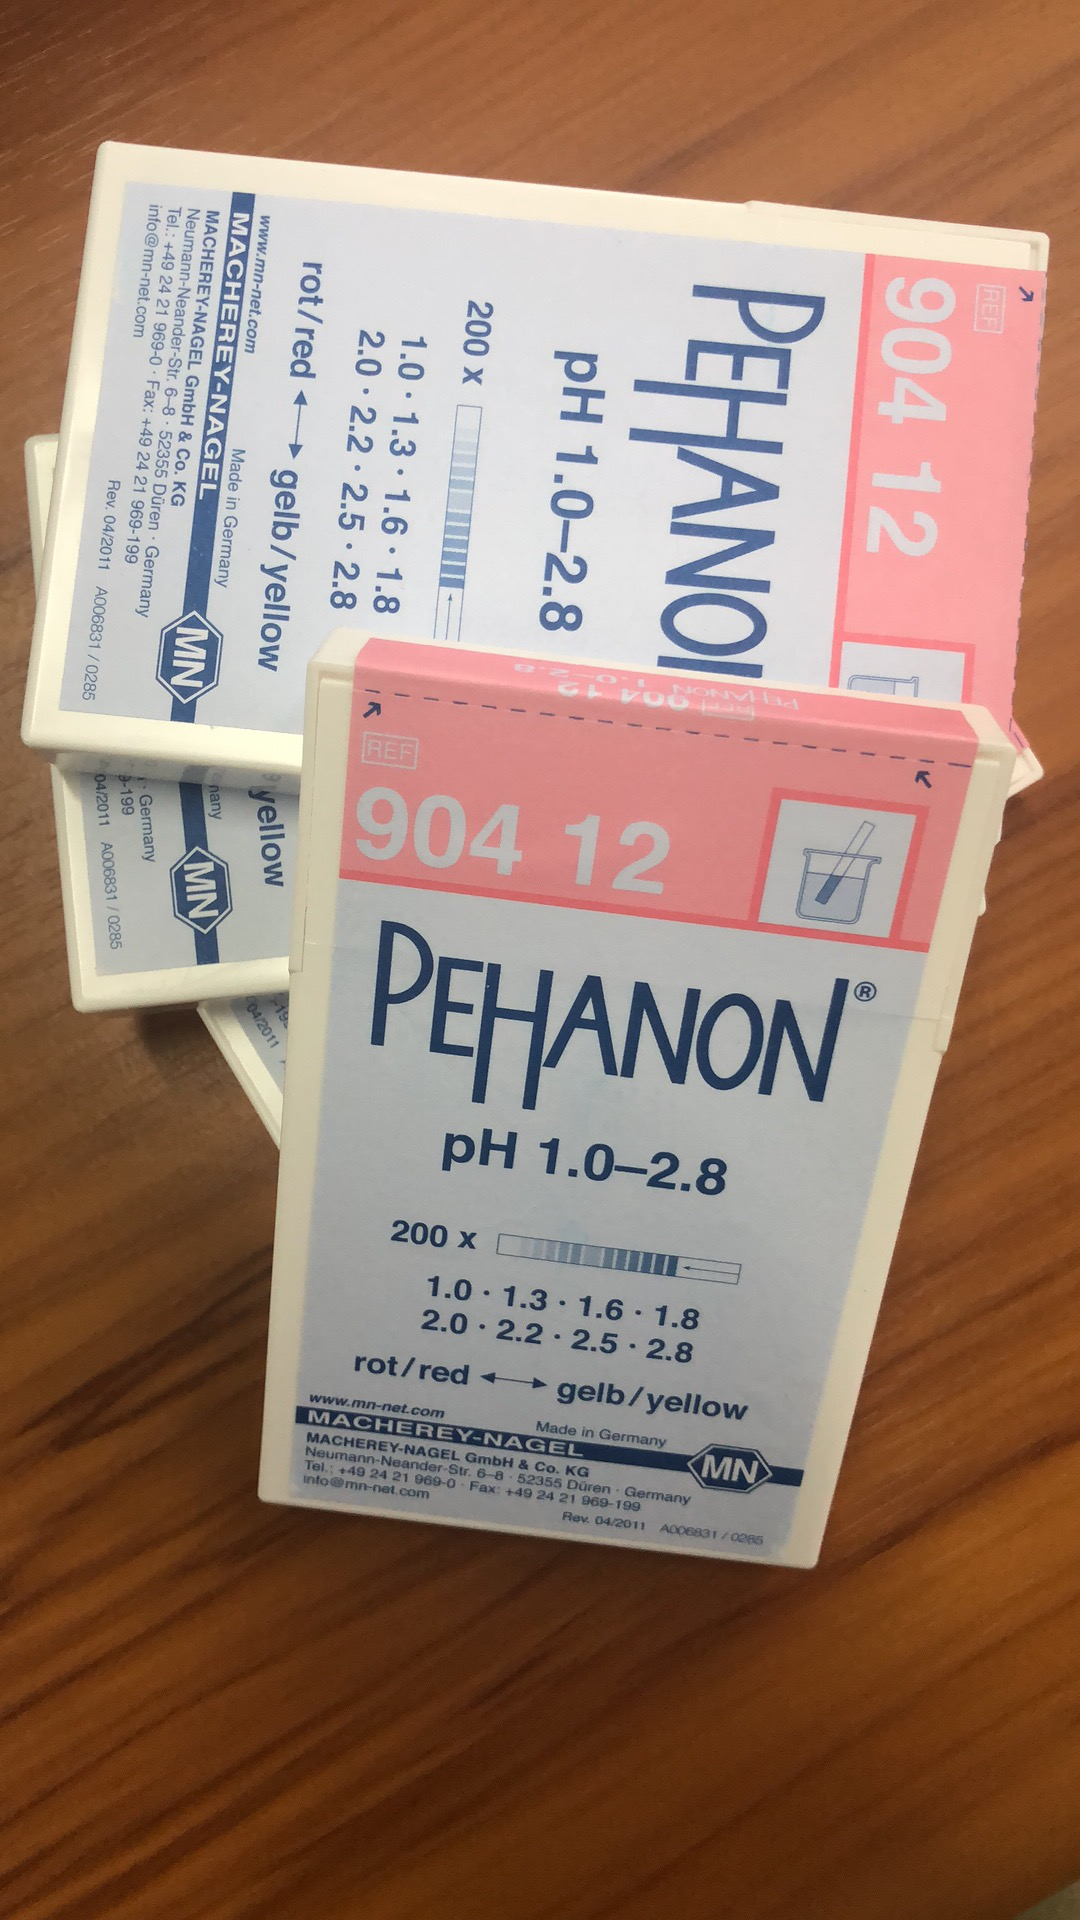 德国MN PEHANON 测试条 90412